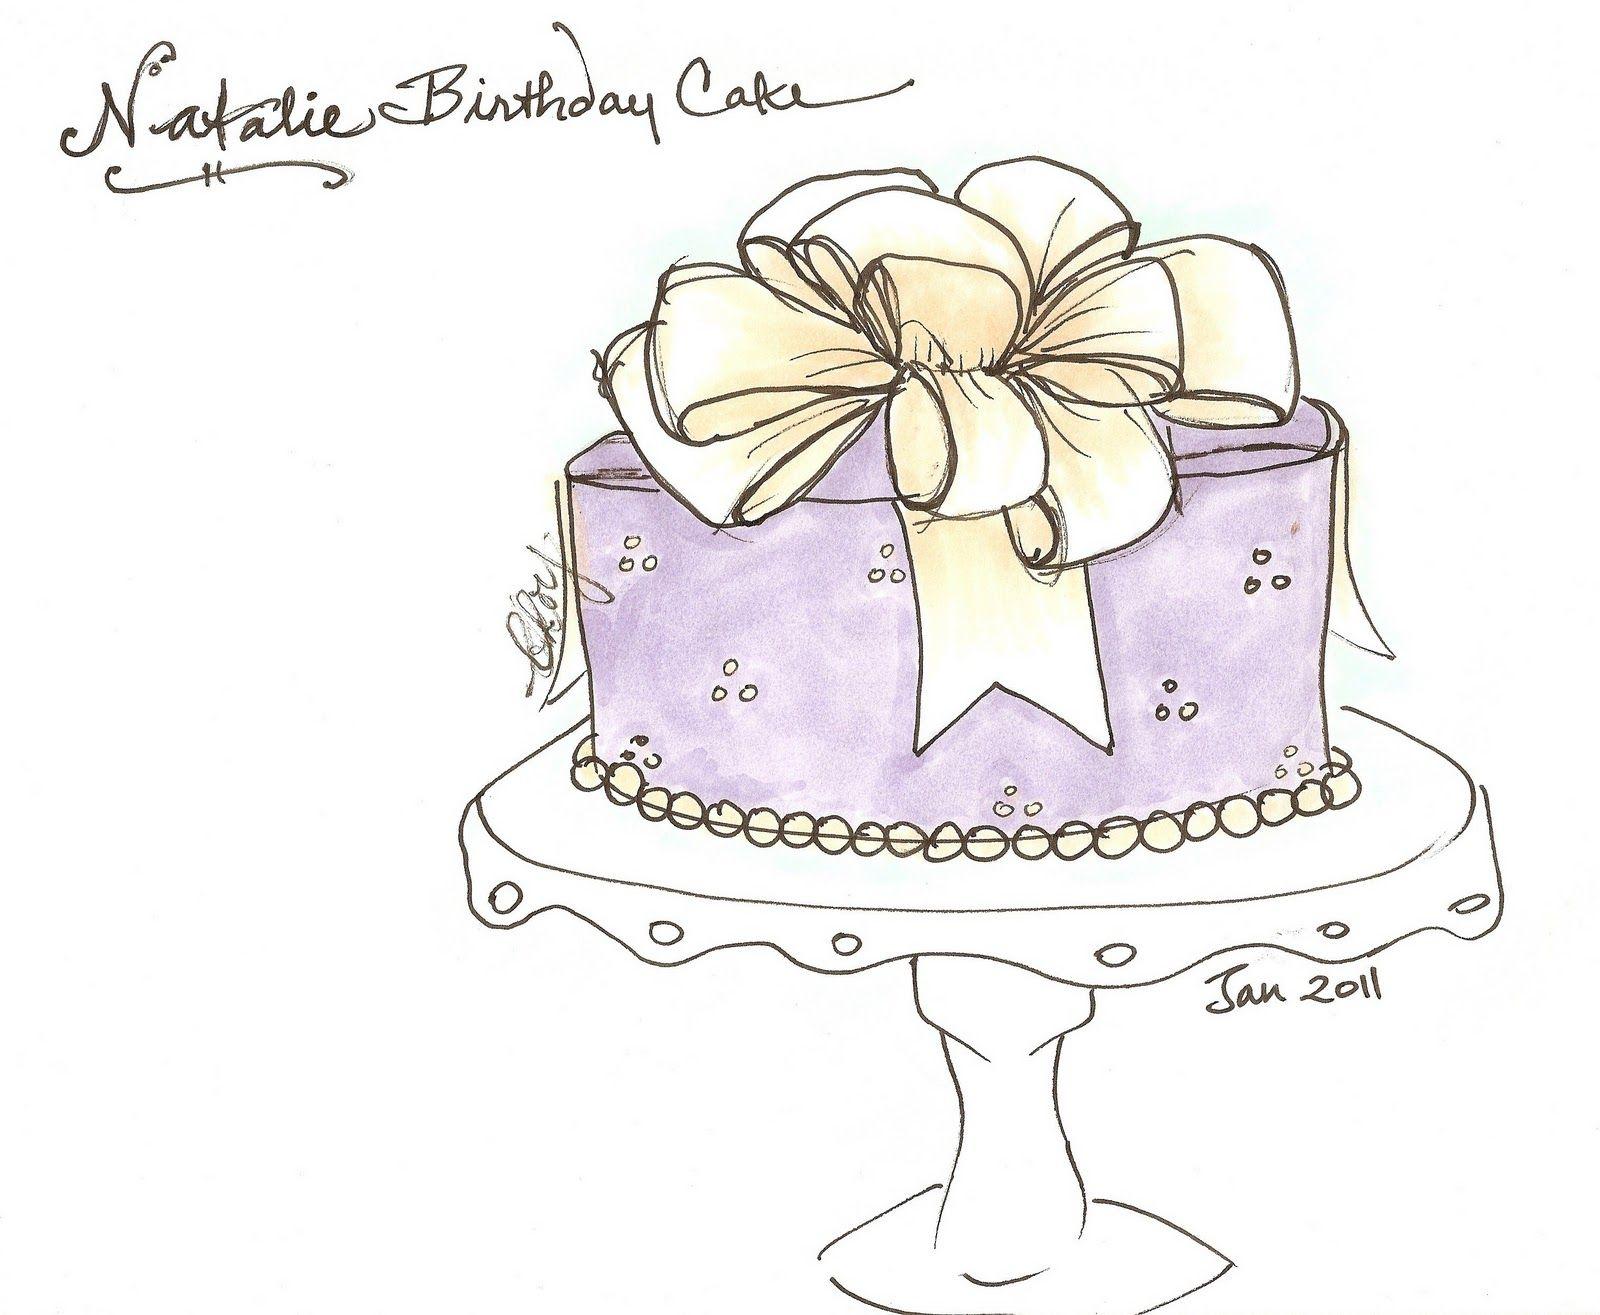 Classy cake drawings.